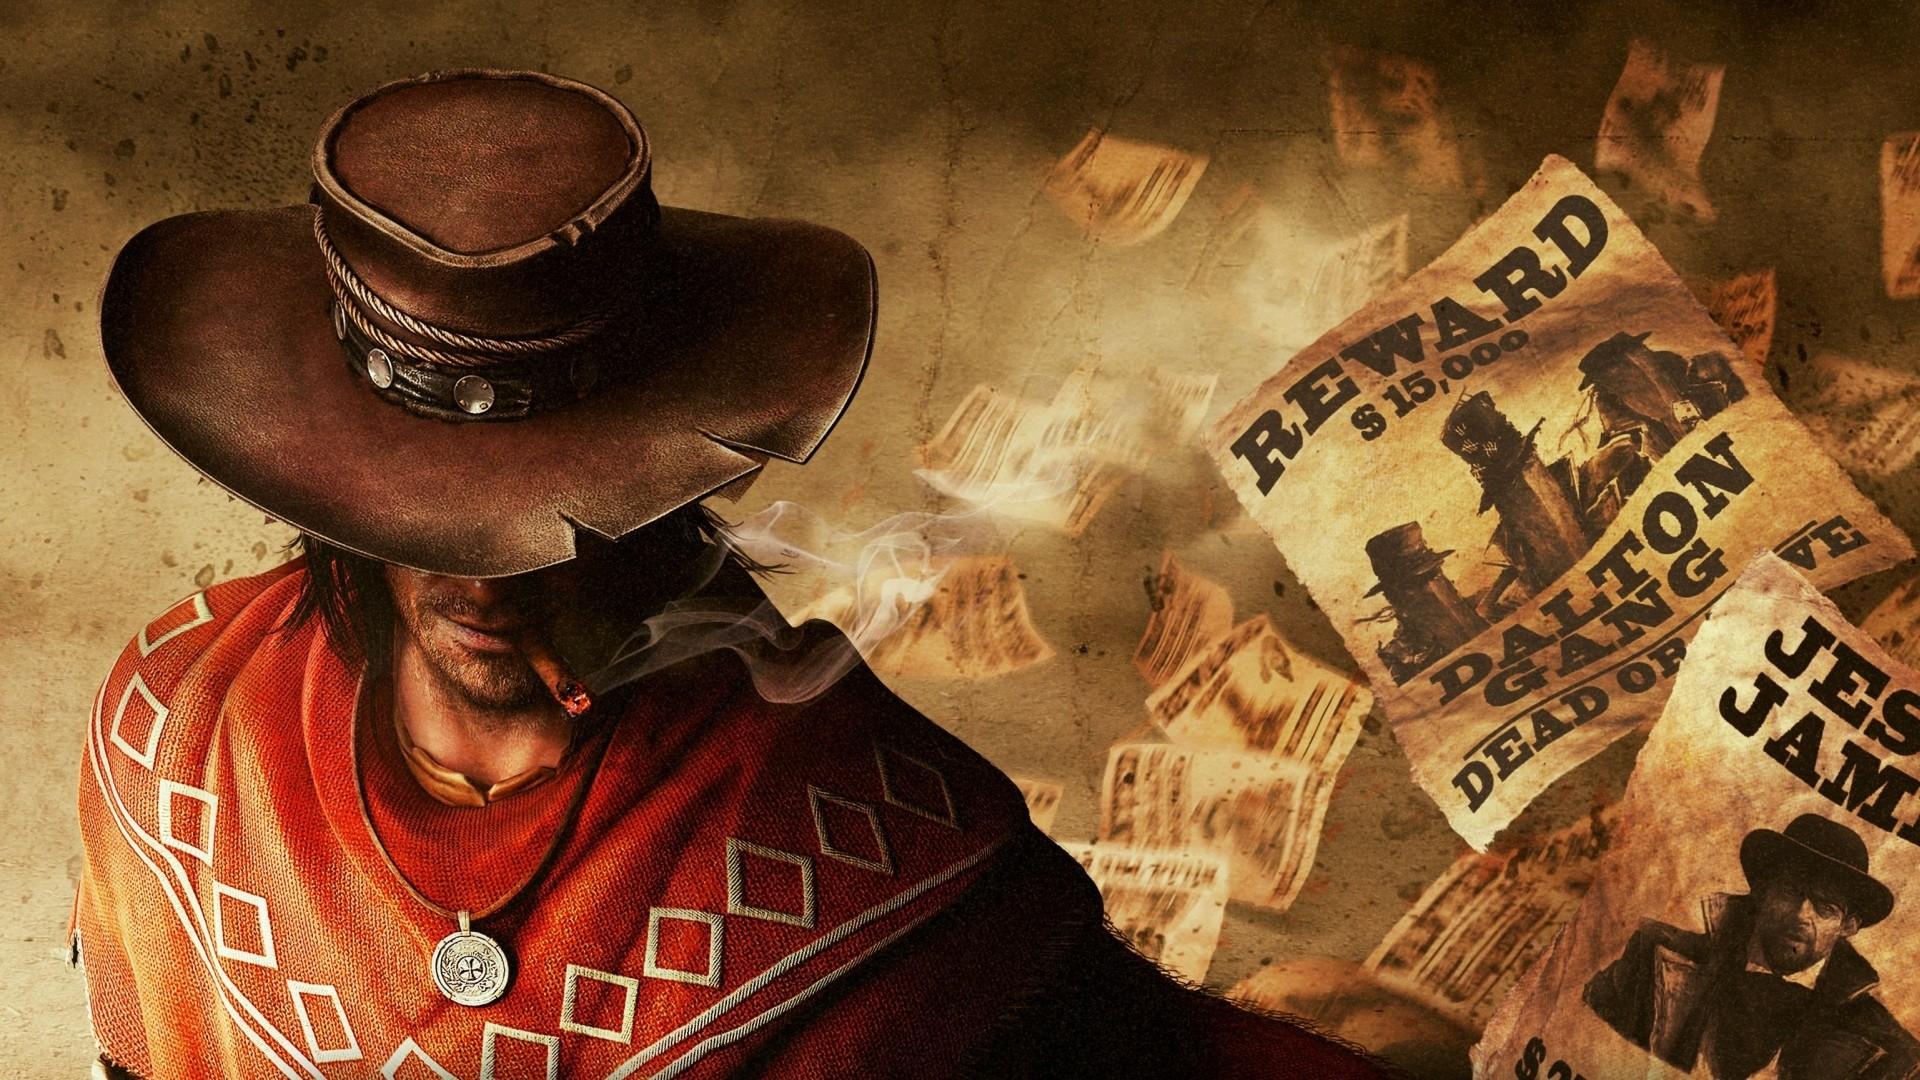 ... western, bounty hunter, Call Of Juarez, wild west, gunslinger, cowboy